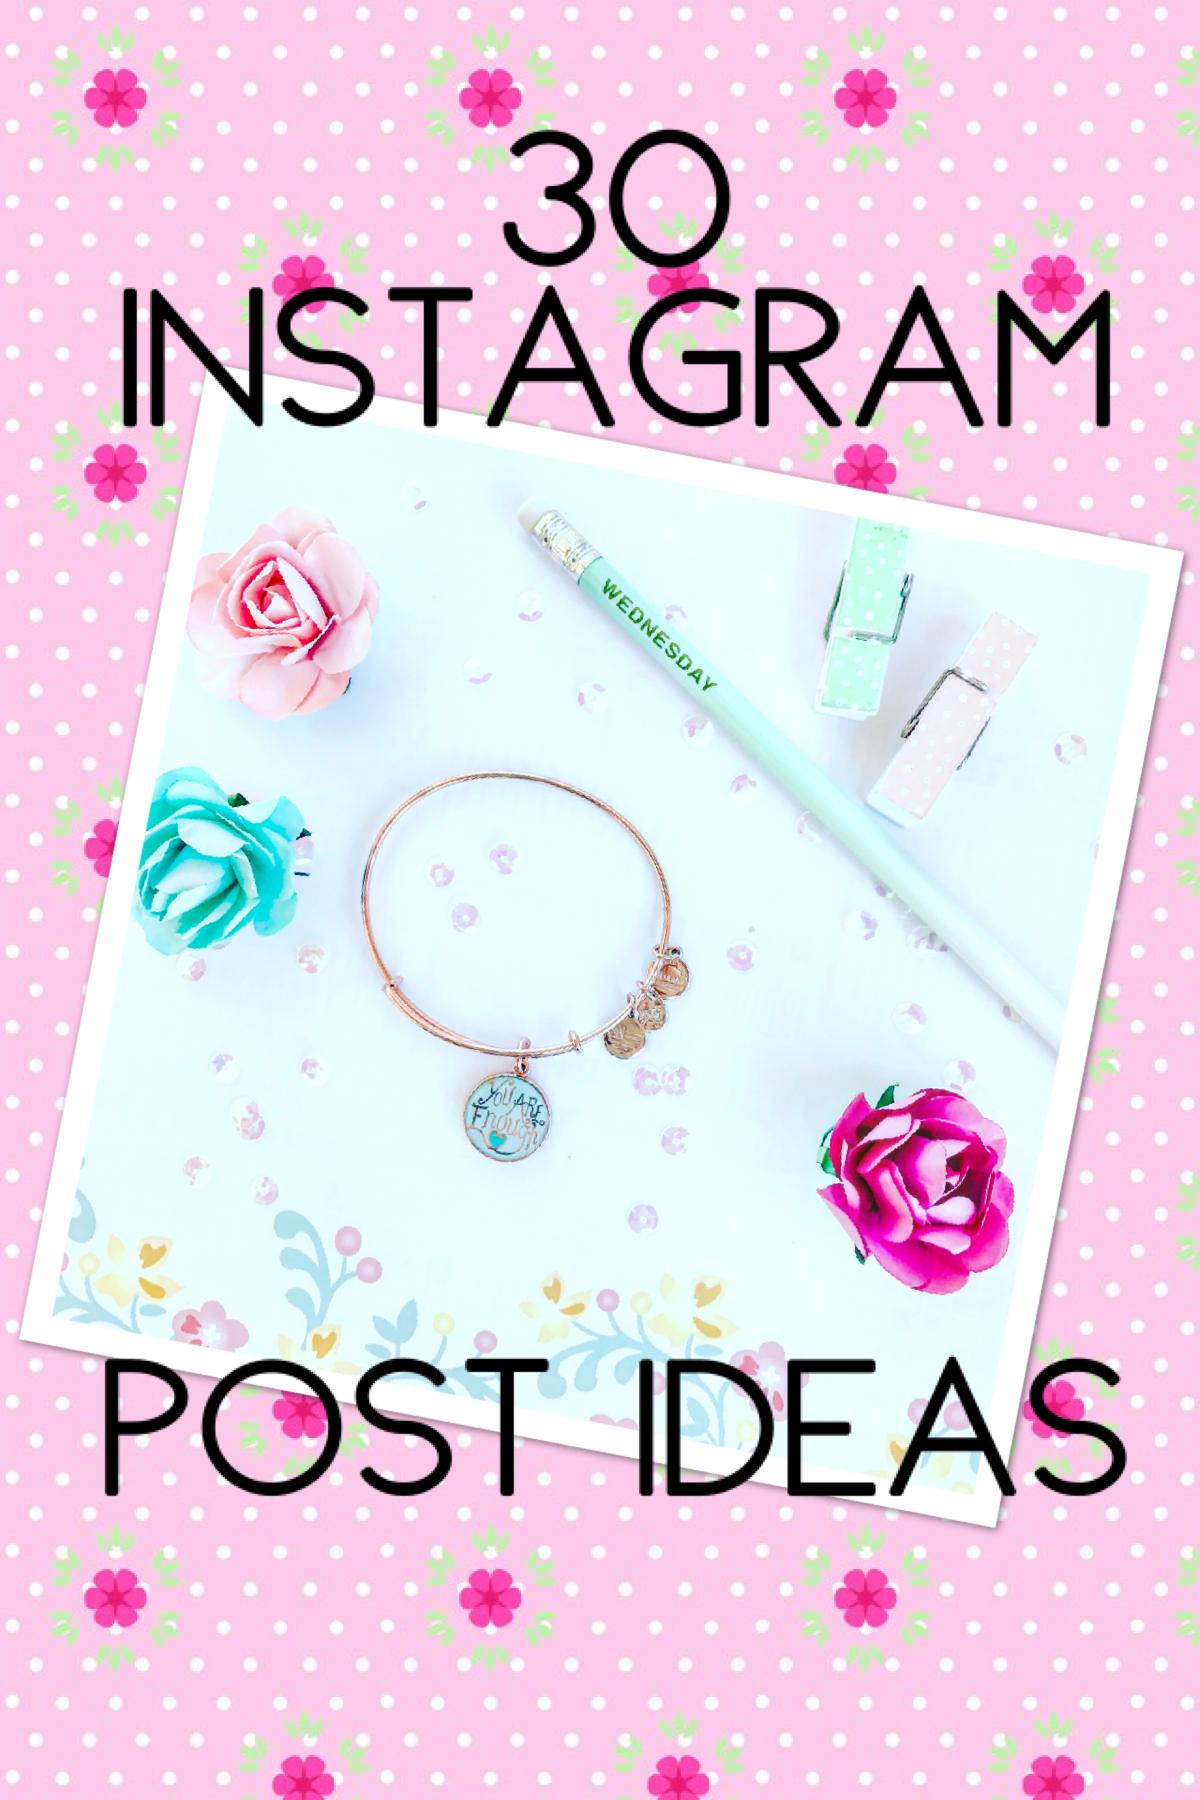 Ŧ'意彩票 Ŧ'意彩票官网 Ŧ'意彩票注册登录 Blog Post Ideas Fashion Instagram Engagement Instagram Posts